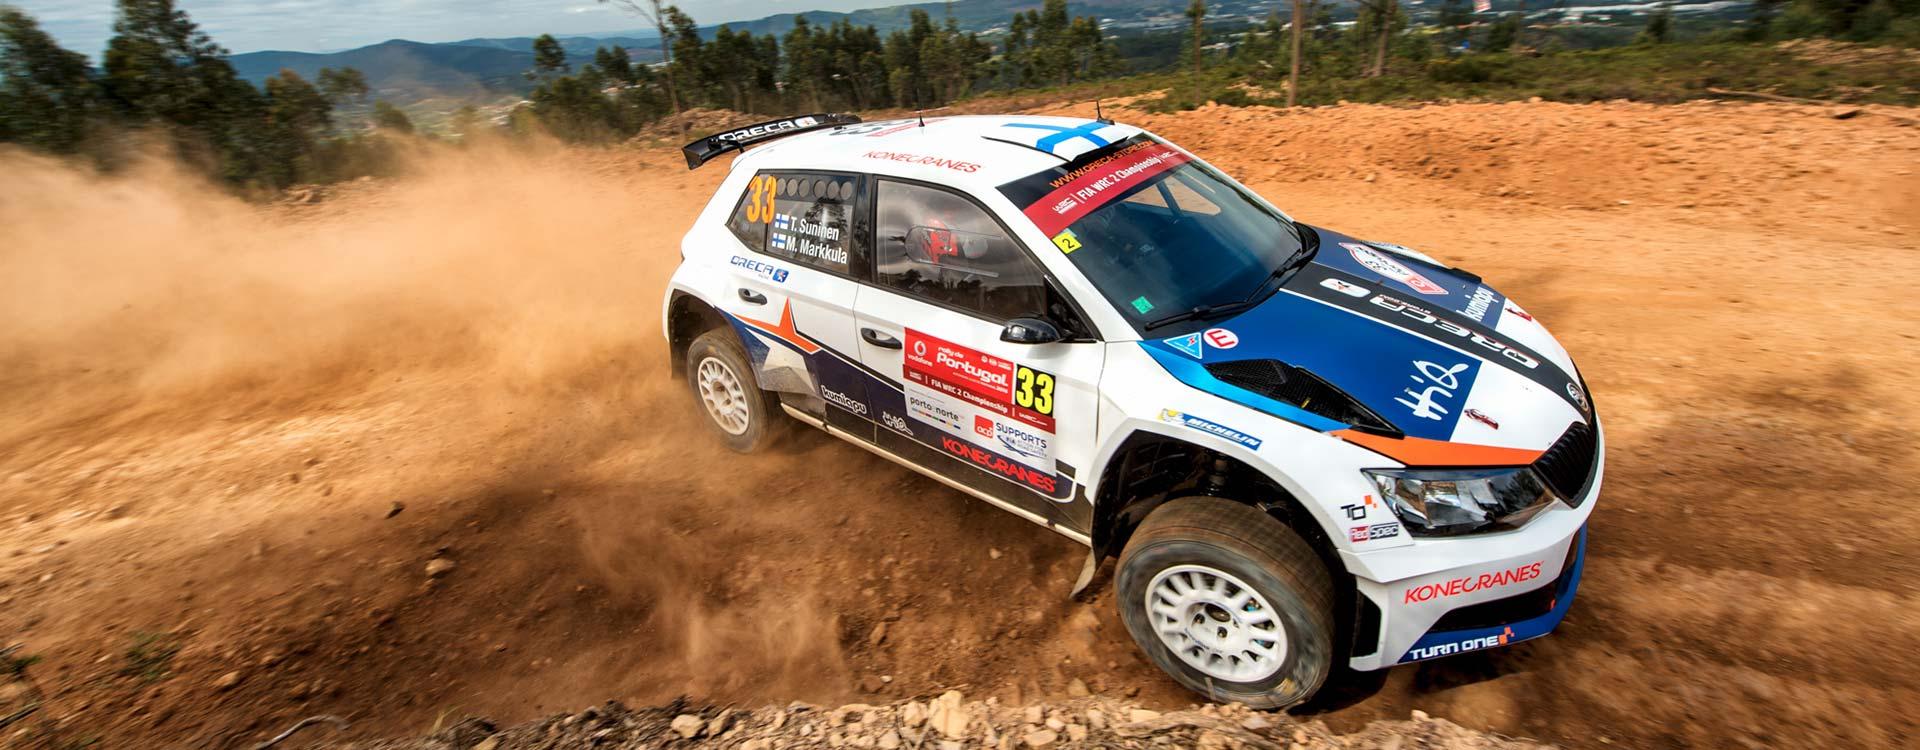 PHOTO: ŠKODA Customer Teams at the Rally de Portugal